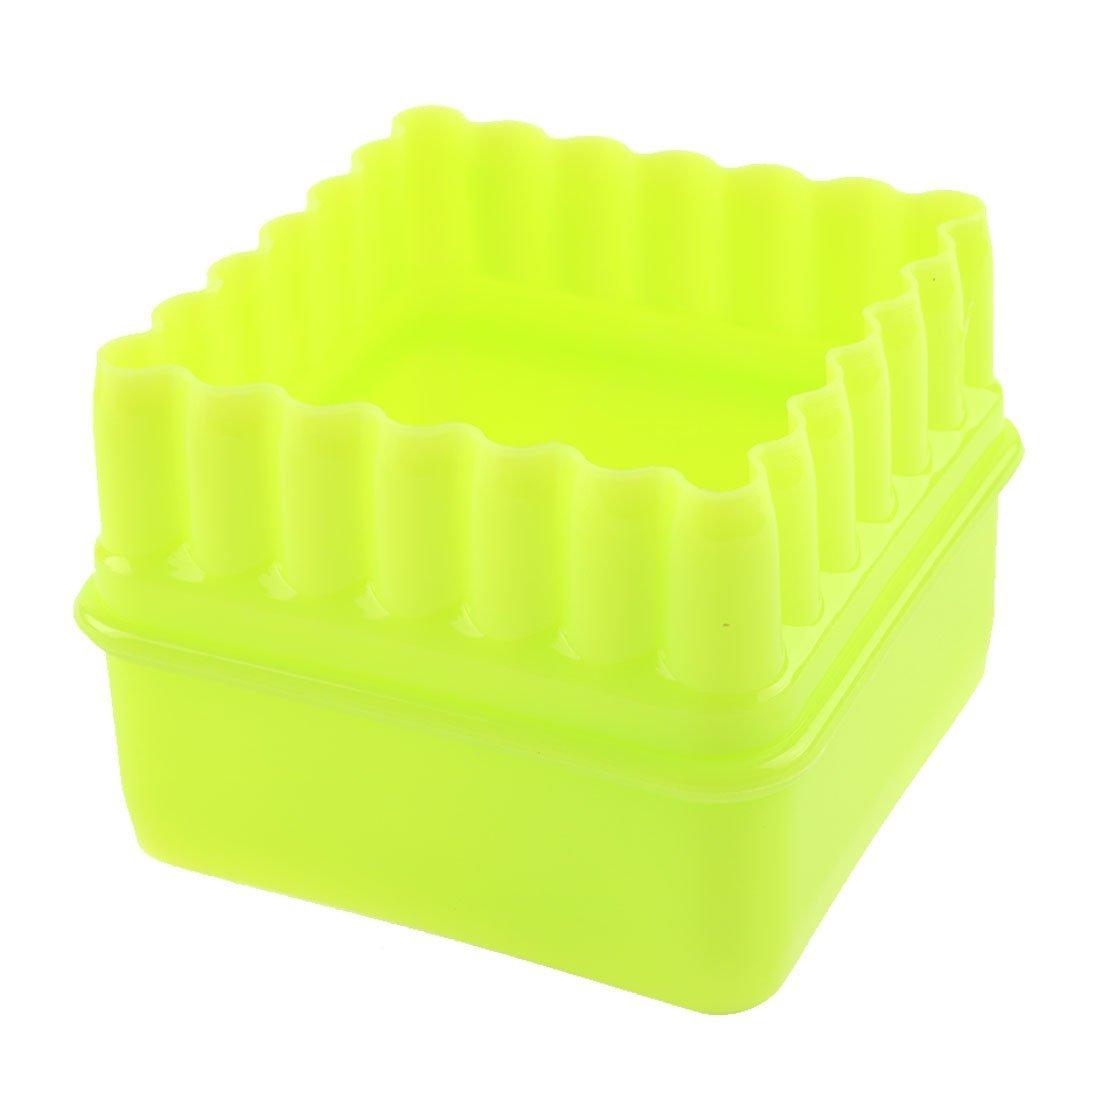 Amazon.com: DealMux Plastic Casa Cozinha Bakeware Praça Shaped Muffin Cupcake Moldes 5 em 1: Kitchen & Dining